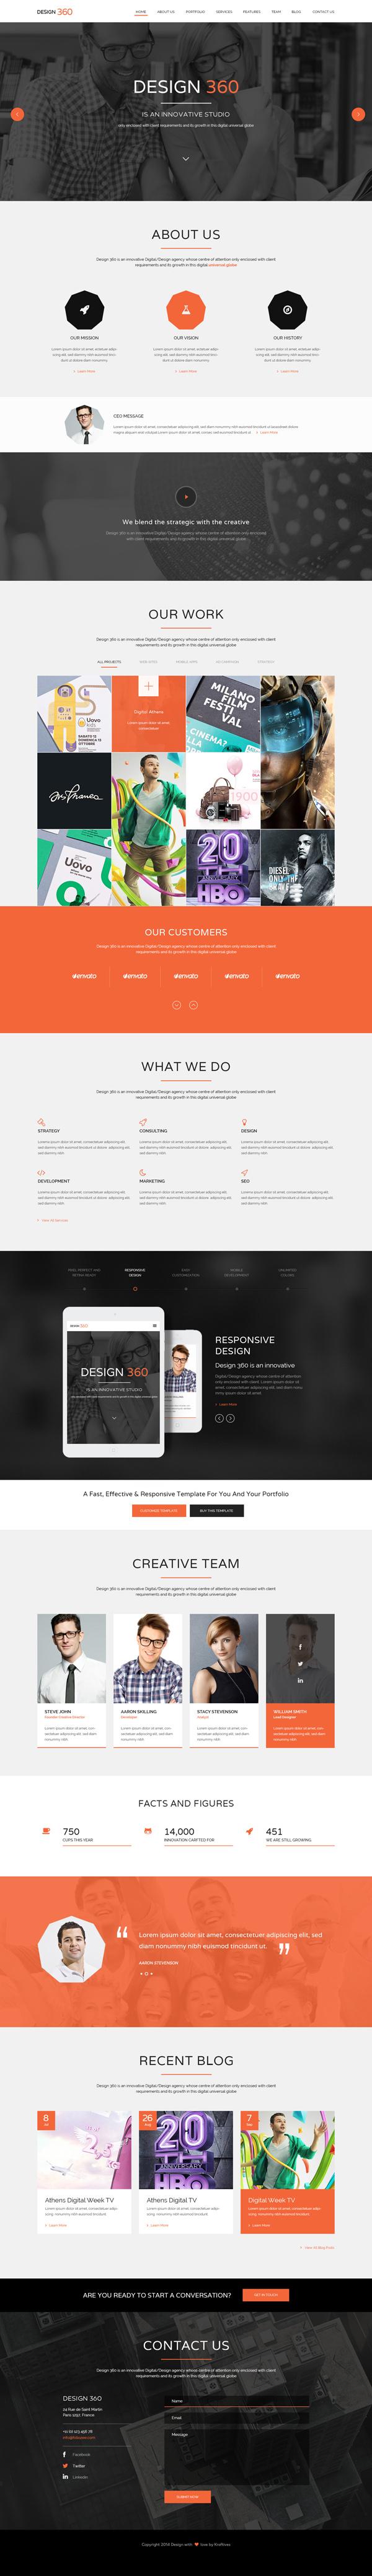 Design 3605 - Single Page PSD HTML5 Template